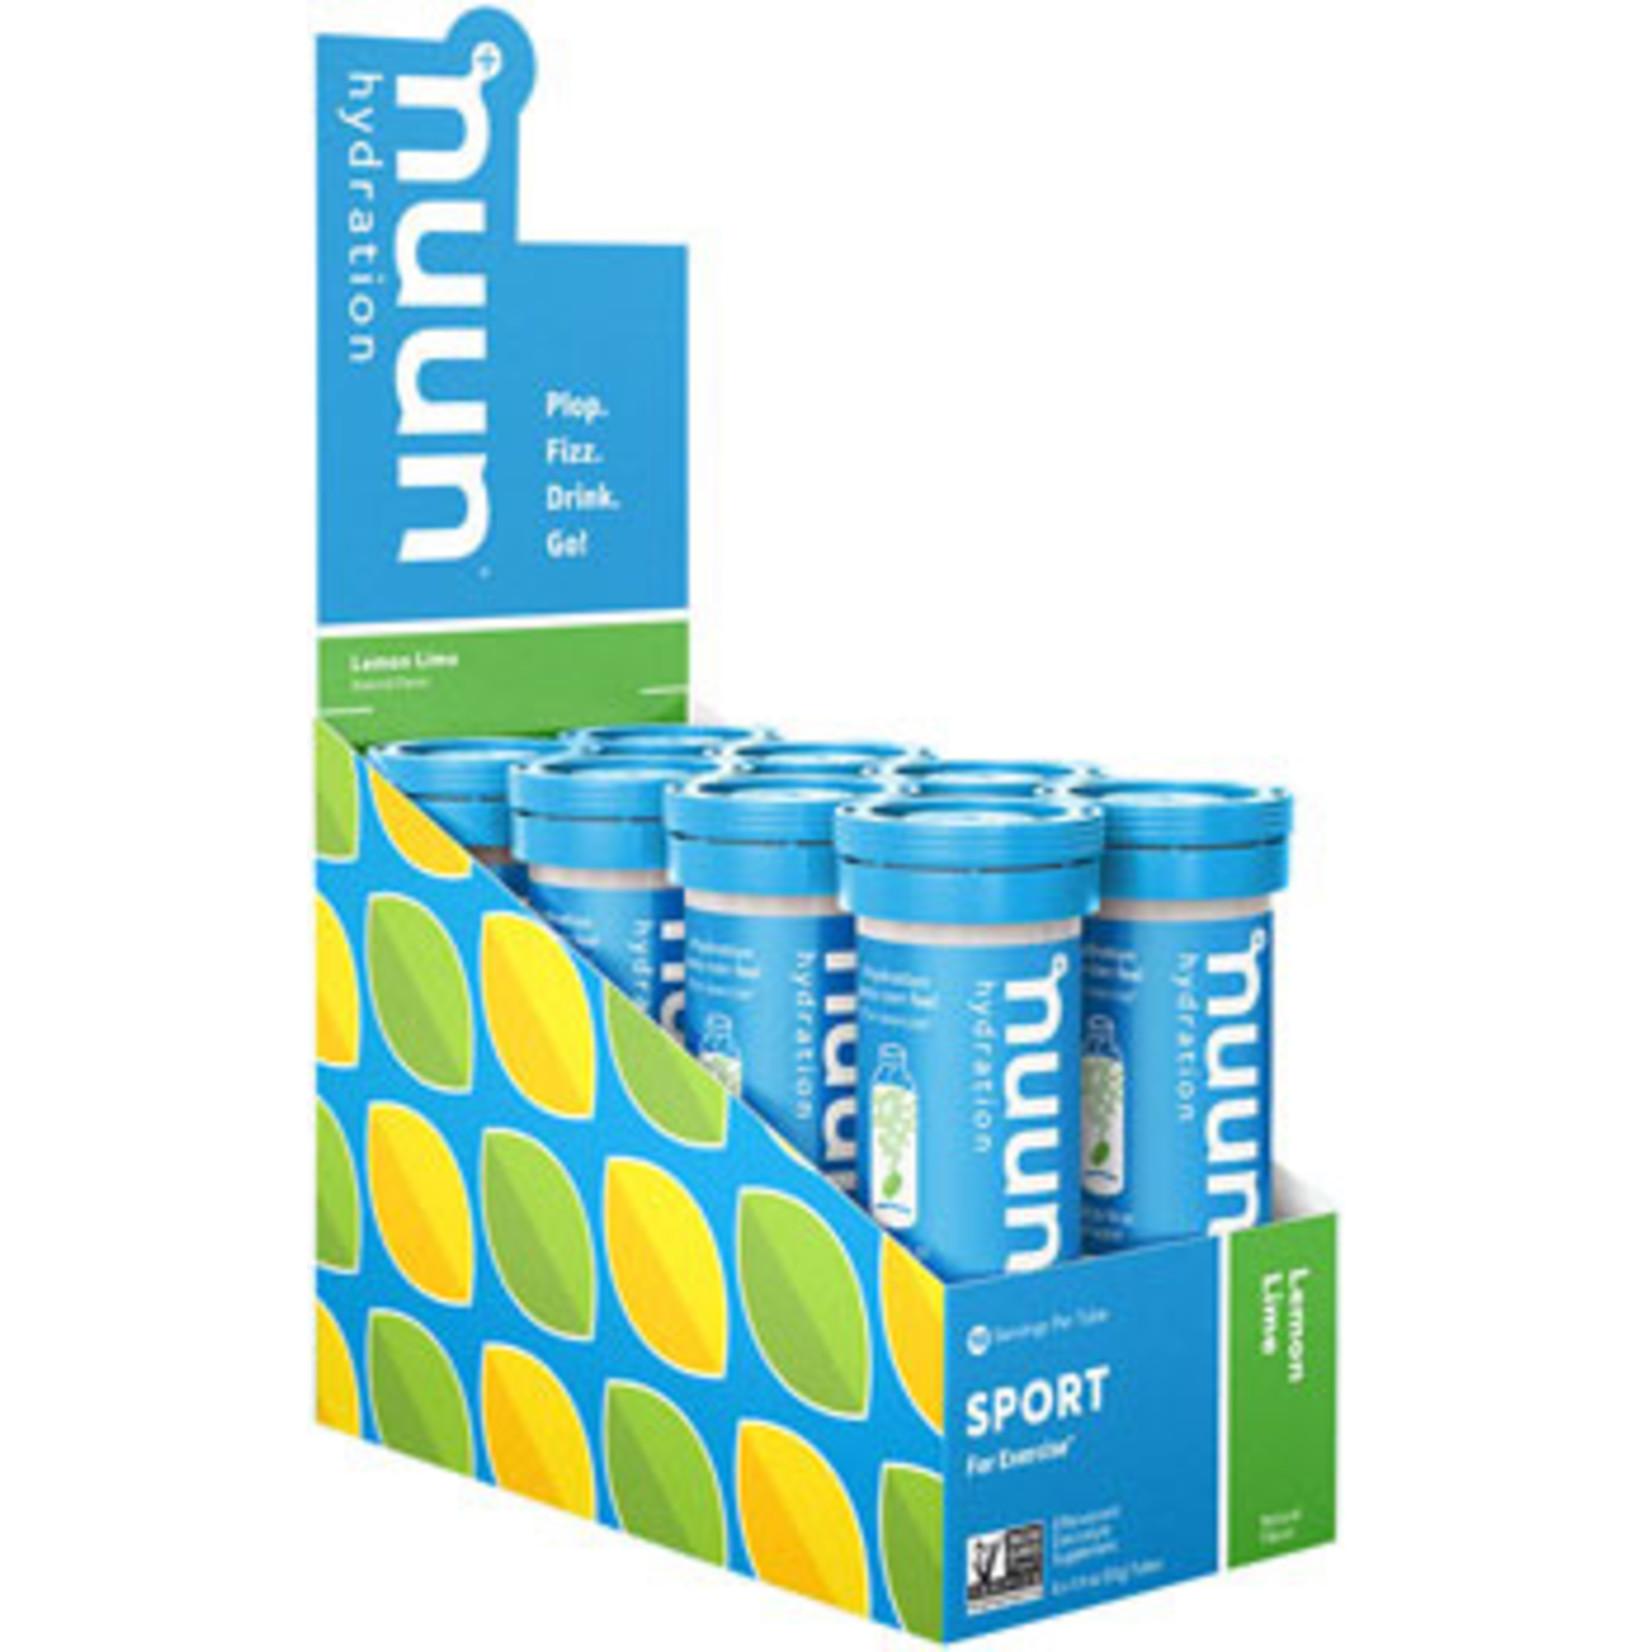 Nuun Nuun Sport Hydration Tablets: Lemon Lime, Box of 8 Tubes